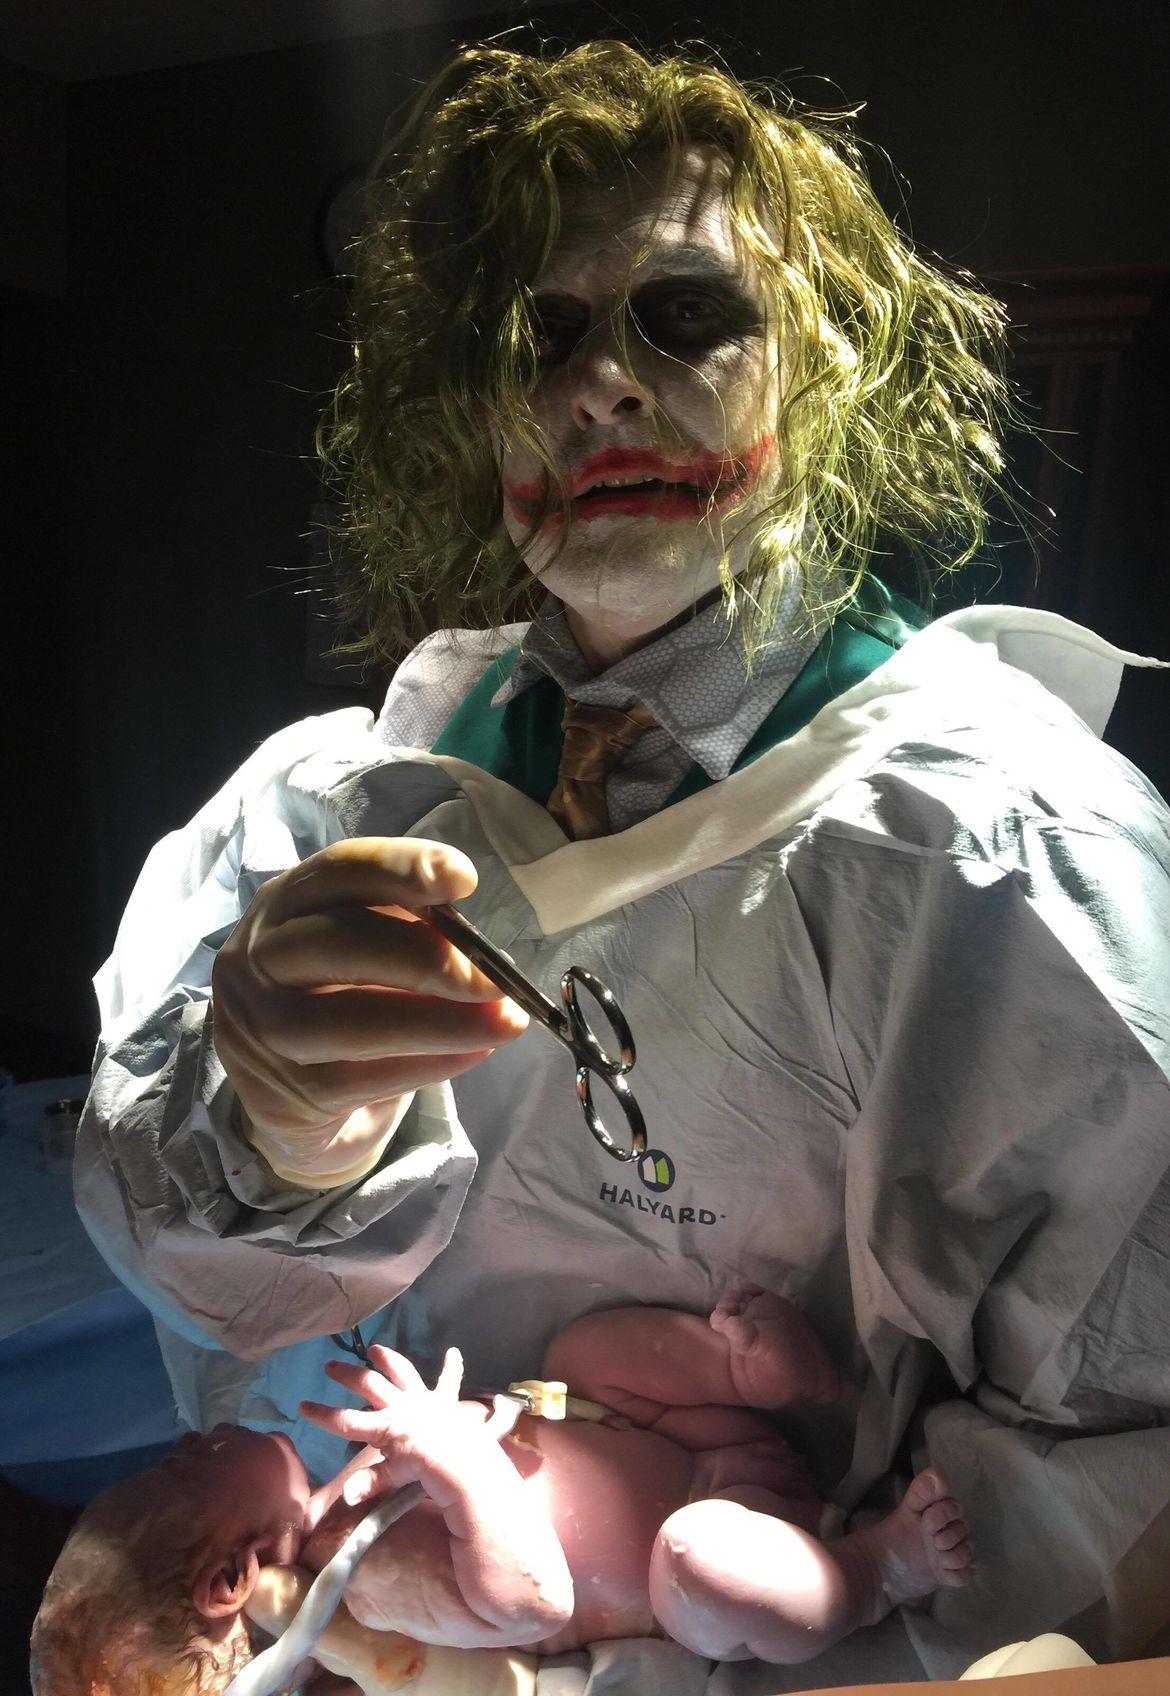 ed36966d63d18 Doctor dresses up as Joker to deliver babies on Halloween